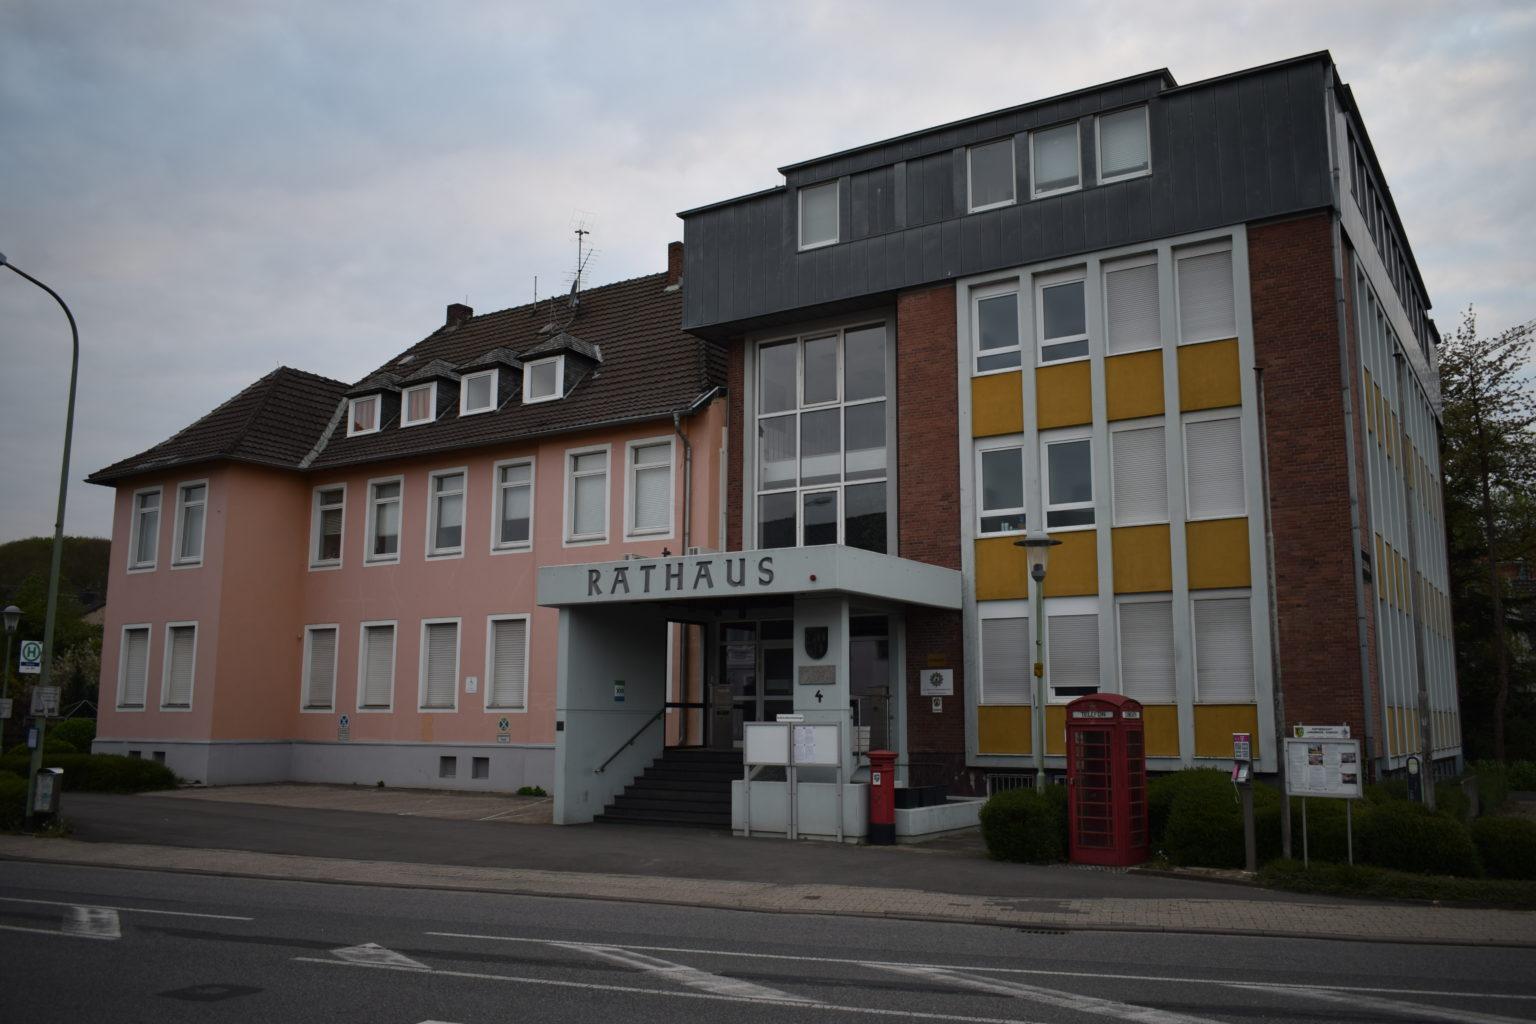 Rathaus Langerwehe